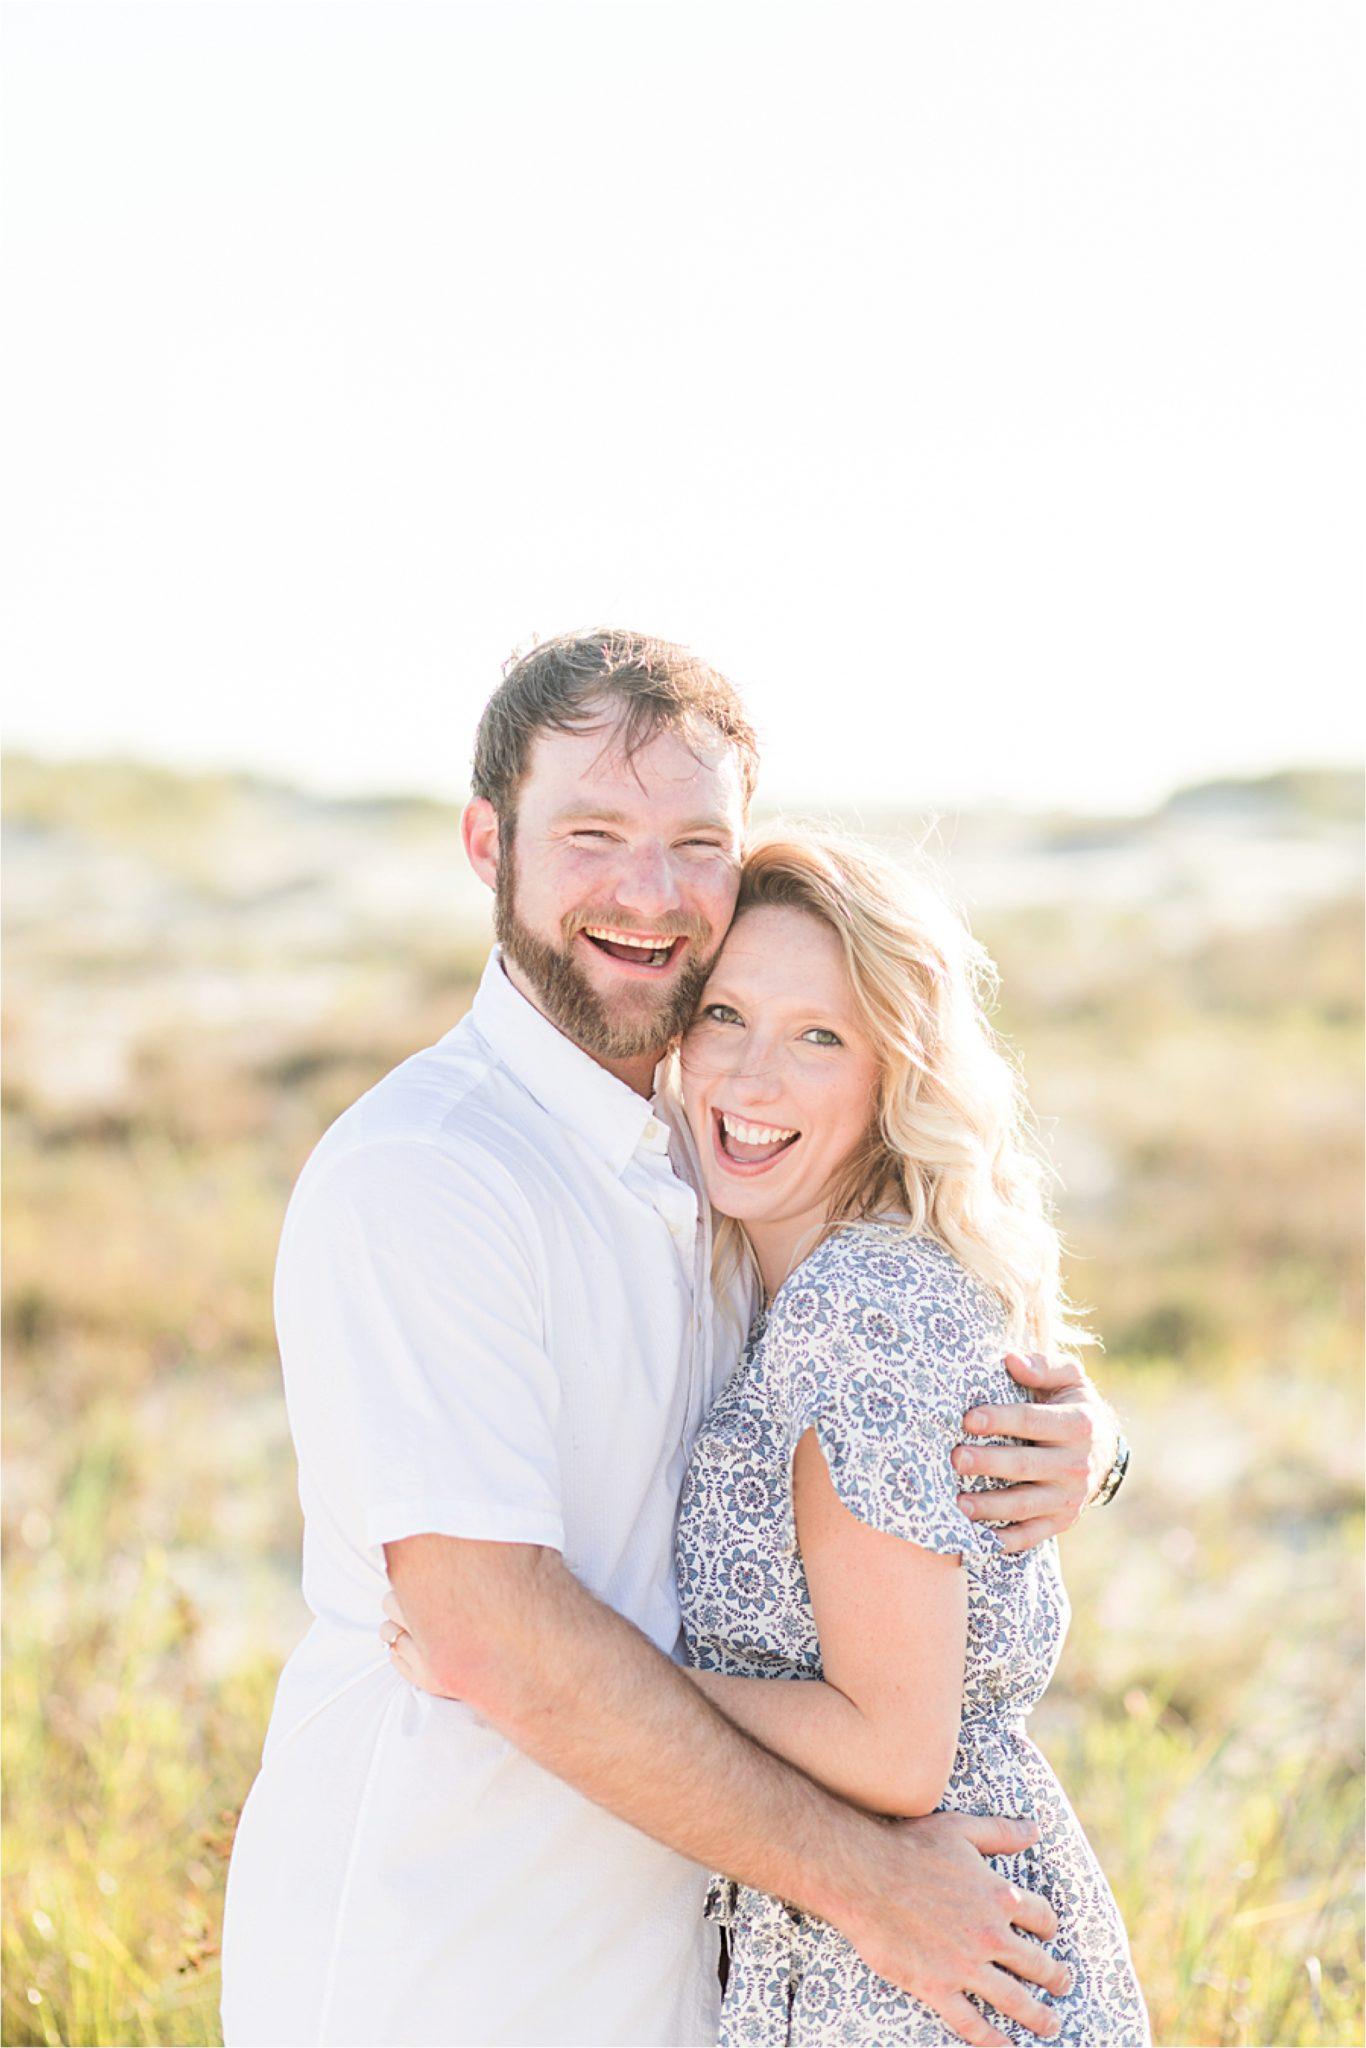 Beach engagement photos, Daulphin Island, Mobile wedding photographer, Candid couples, Romantic engagement shoot inspiration, whimsical engagement shoot